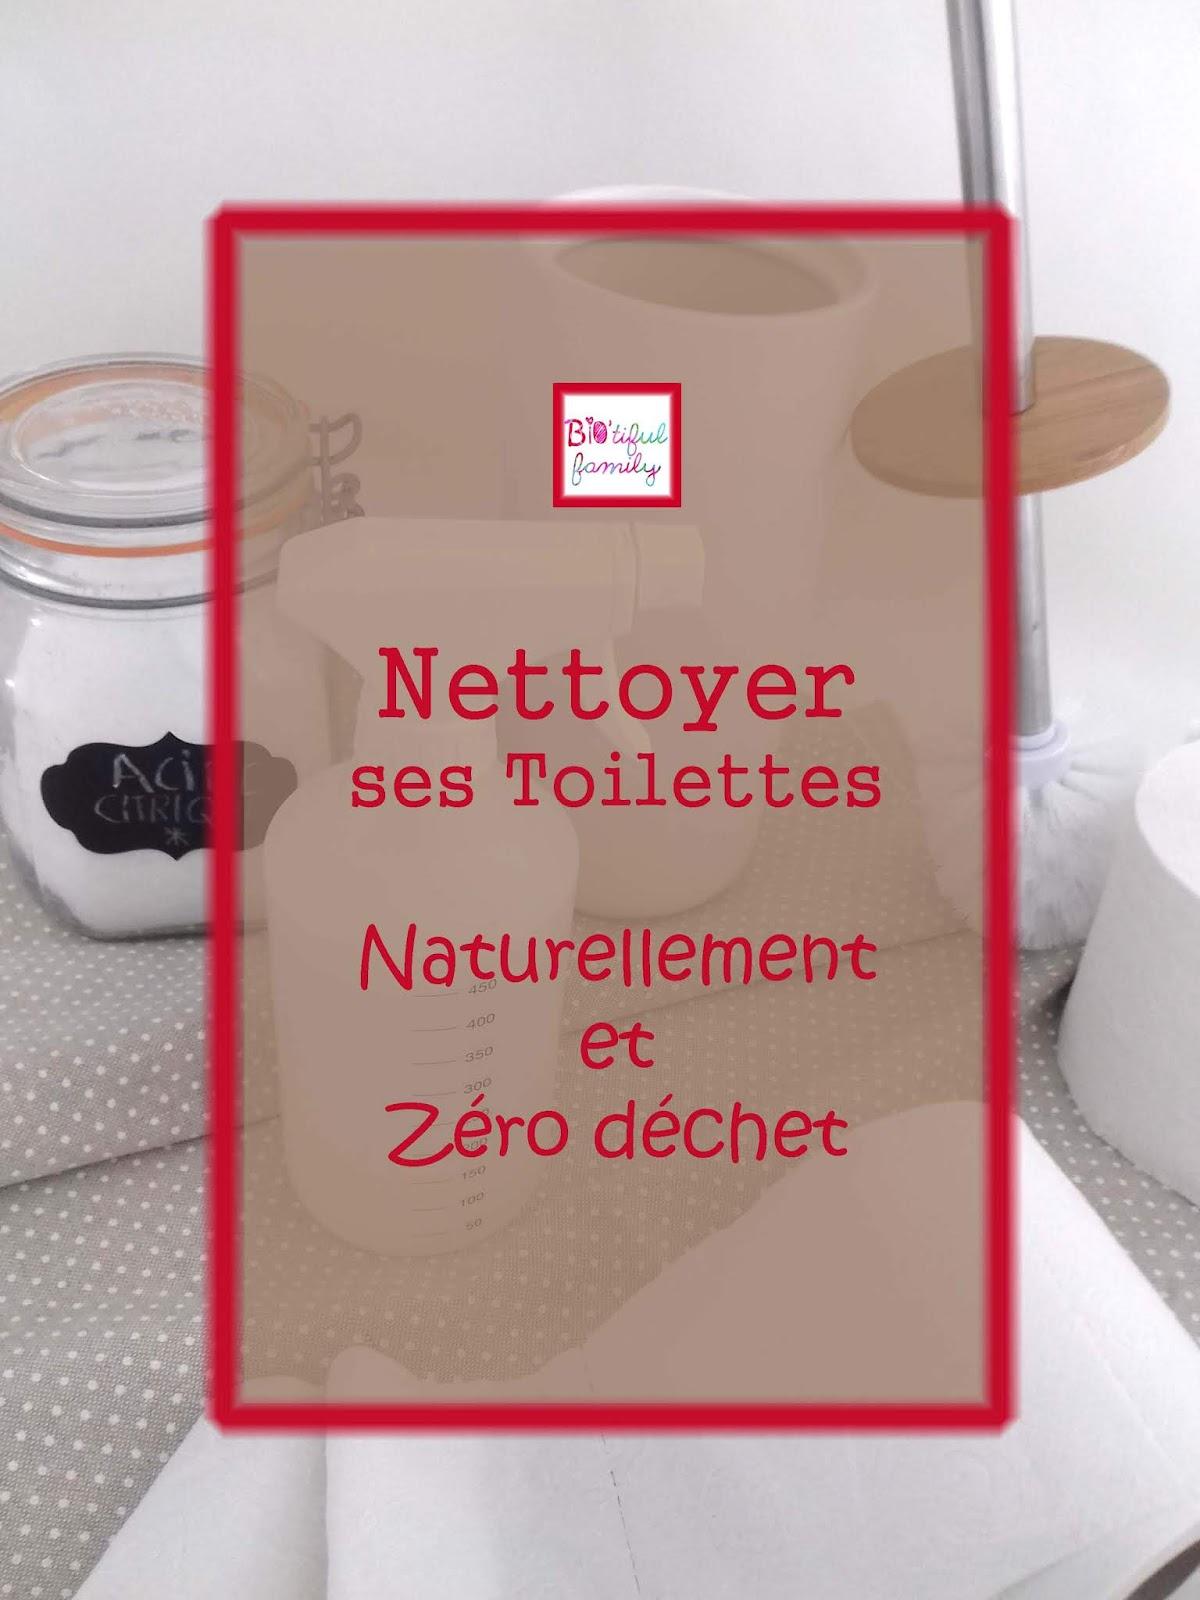 bio 39 tiful family nettoyer ses toilettes naturellement et z ro d chet. Black Bedroom Furniture Sets. Home Design Ideas